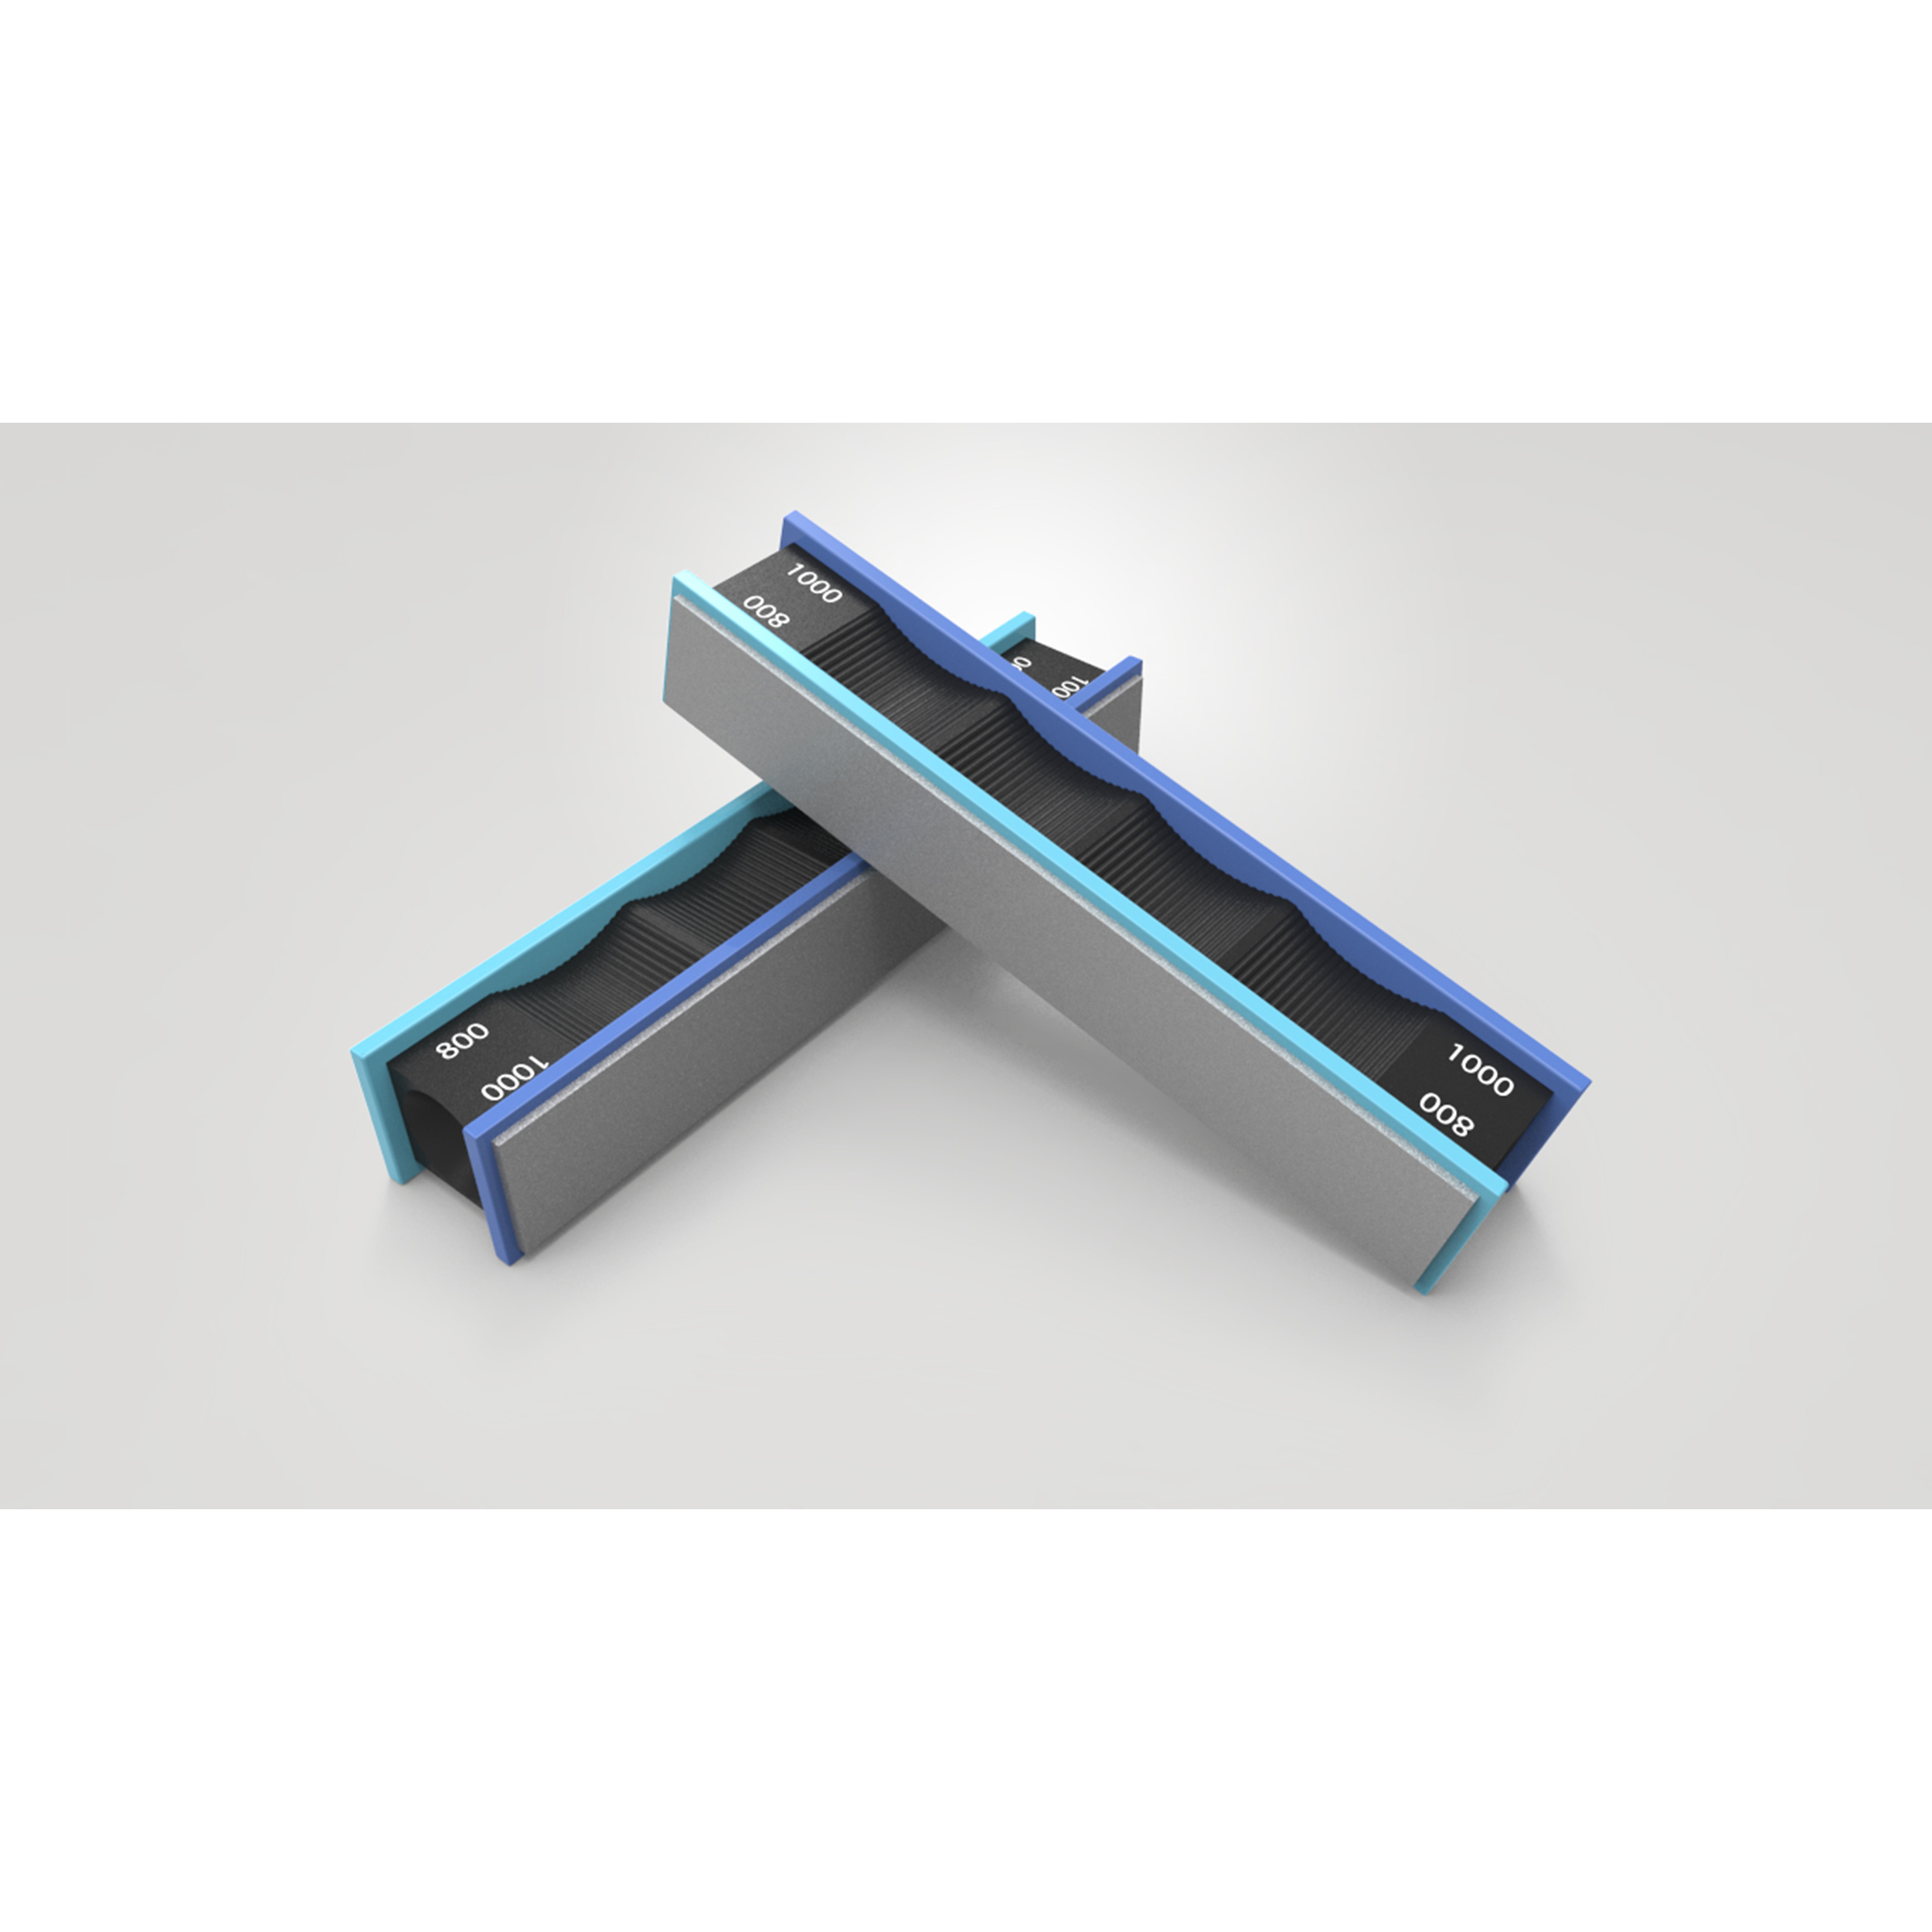 800 Grit / 1000 Grit Diamond Stones Pack